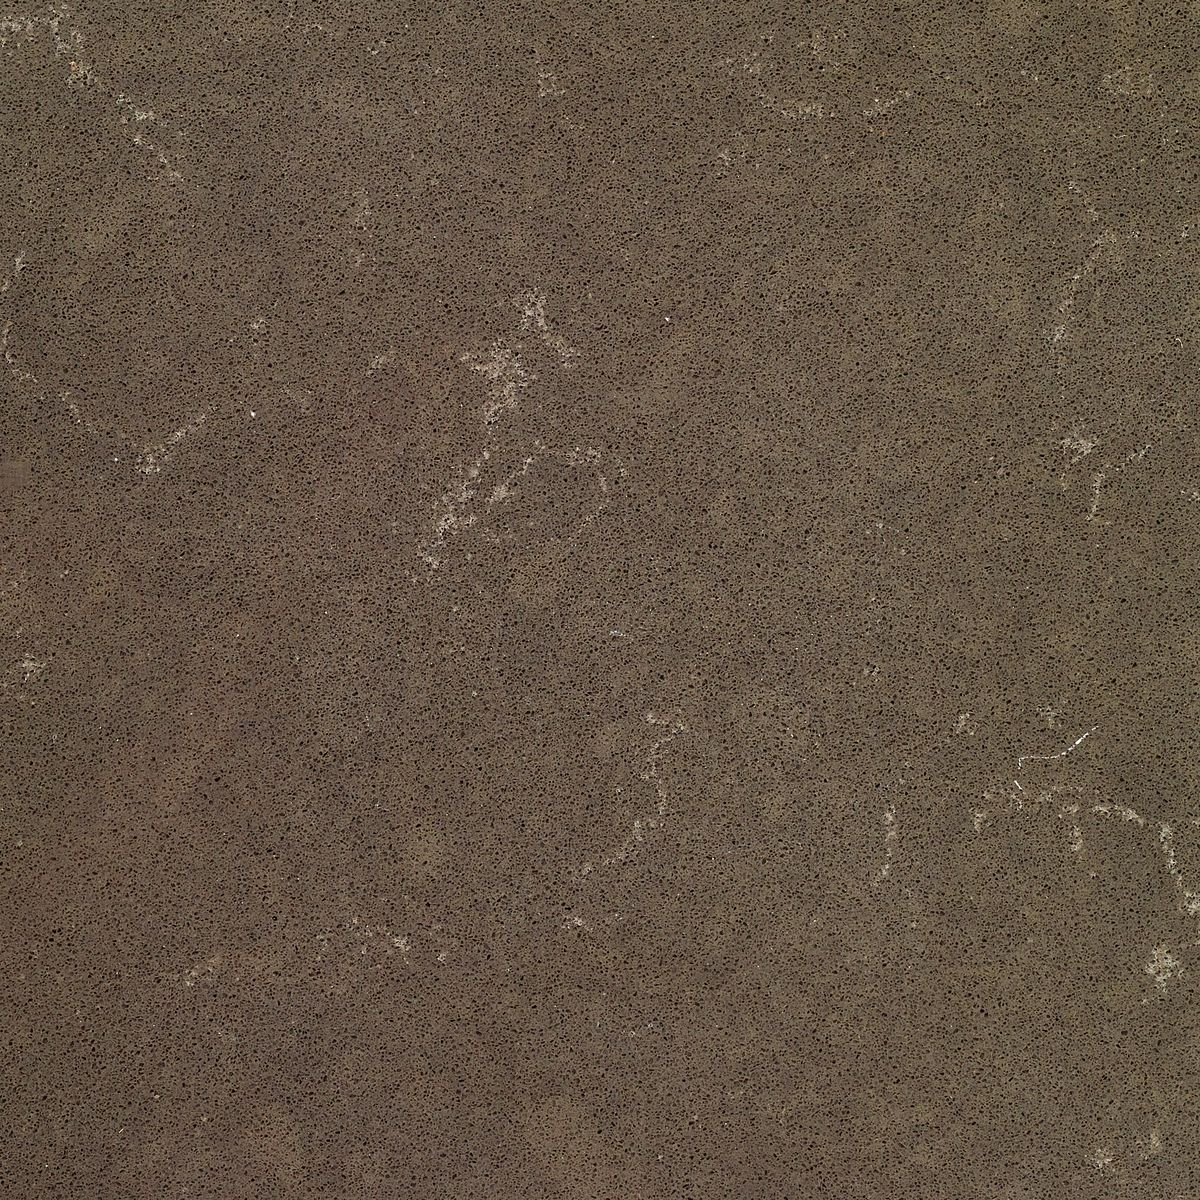 Brown and stone textured quartz color option.